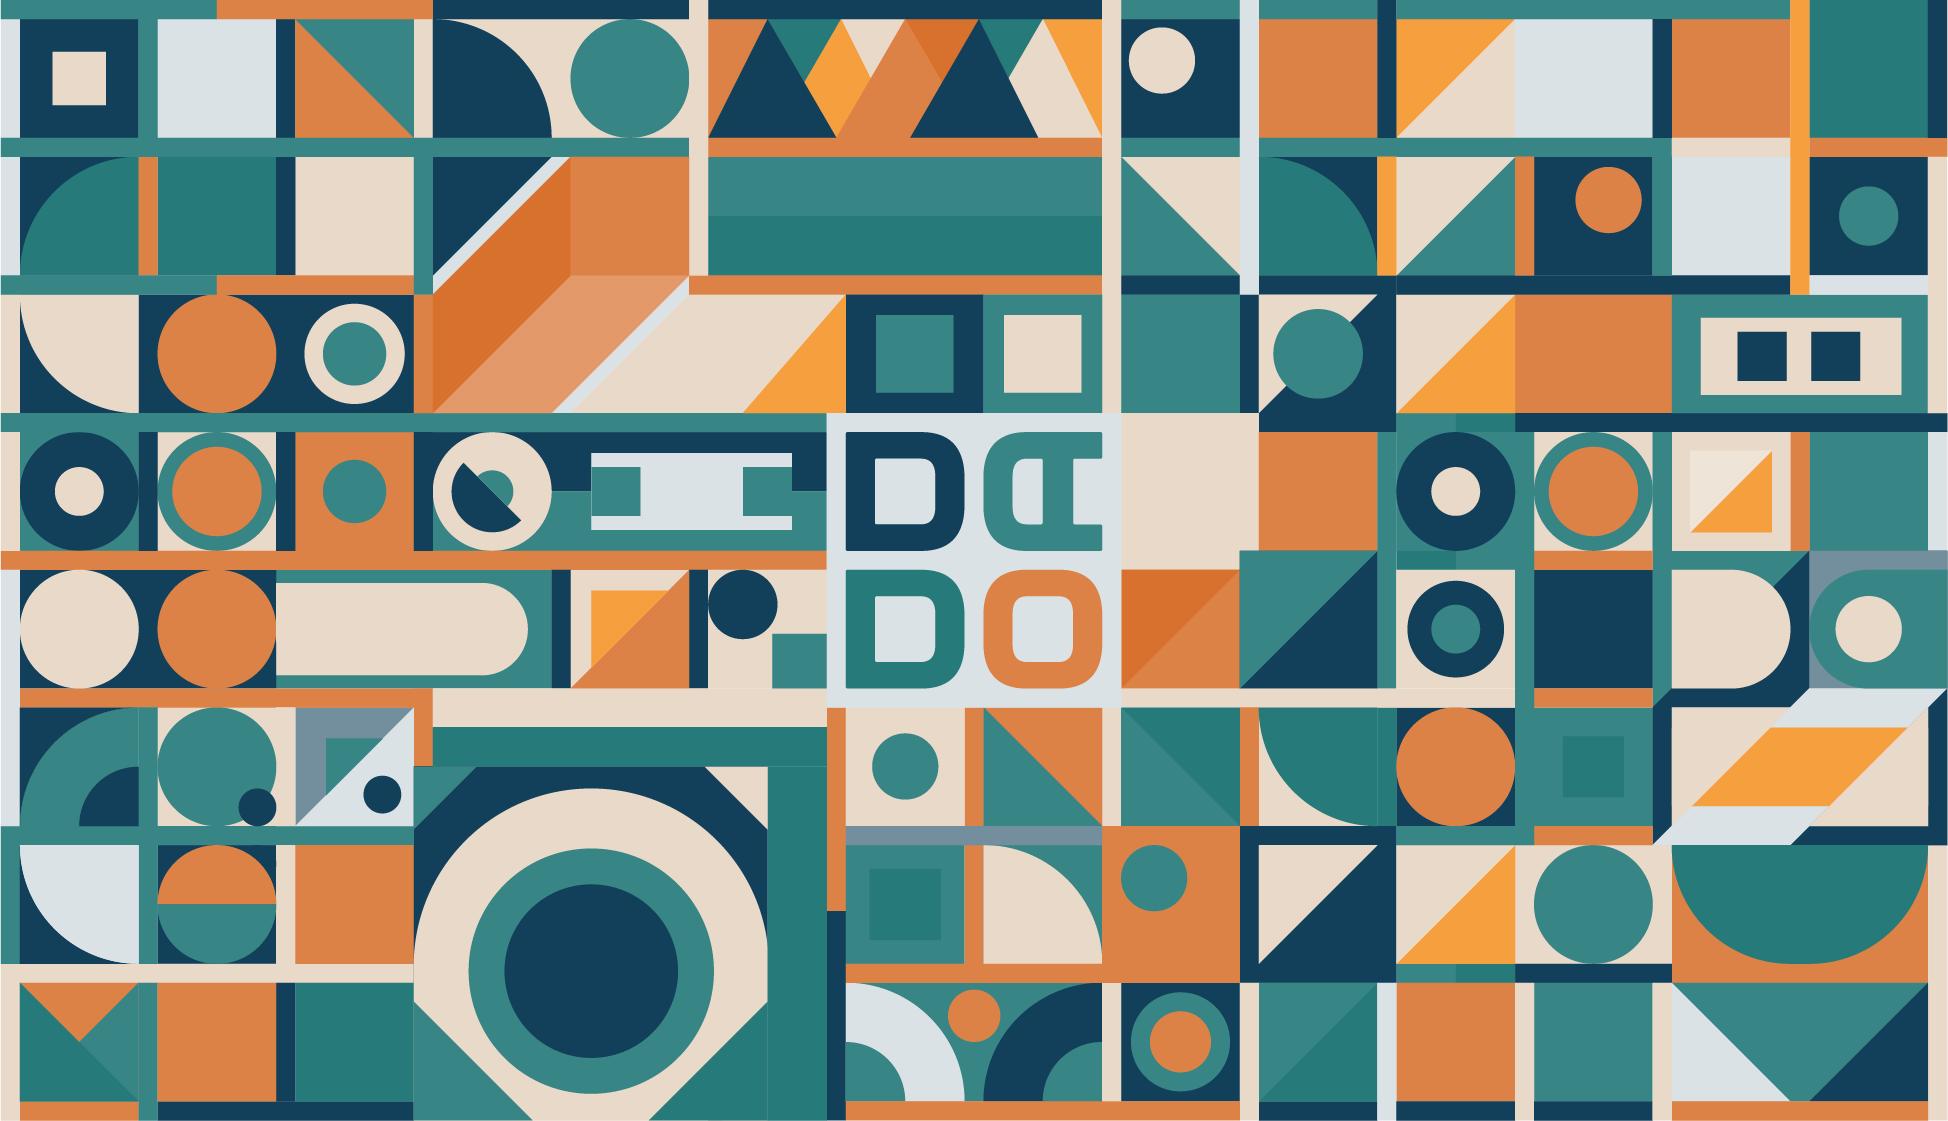 dado logo explore 02